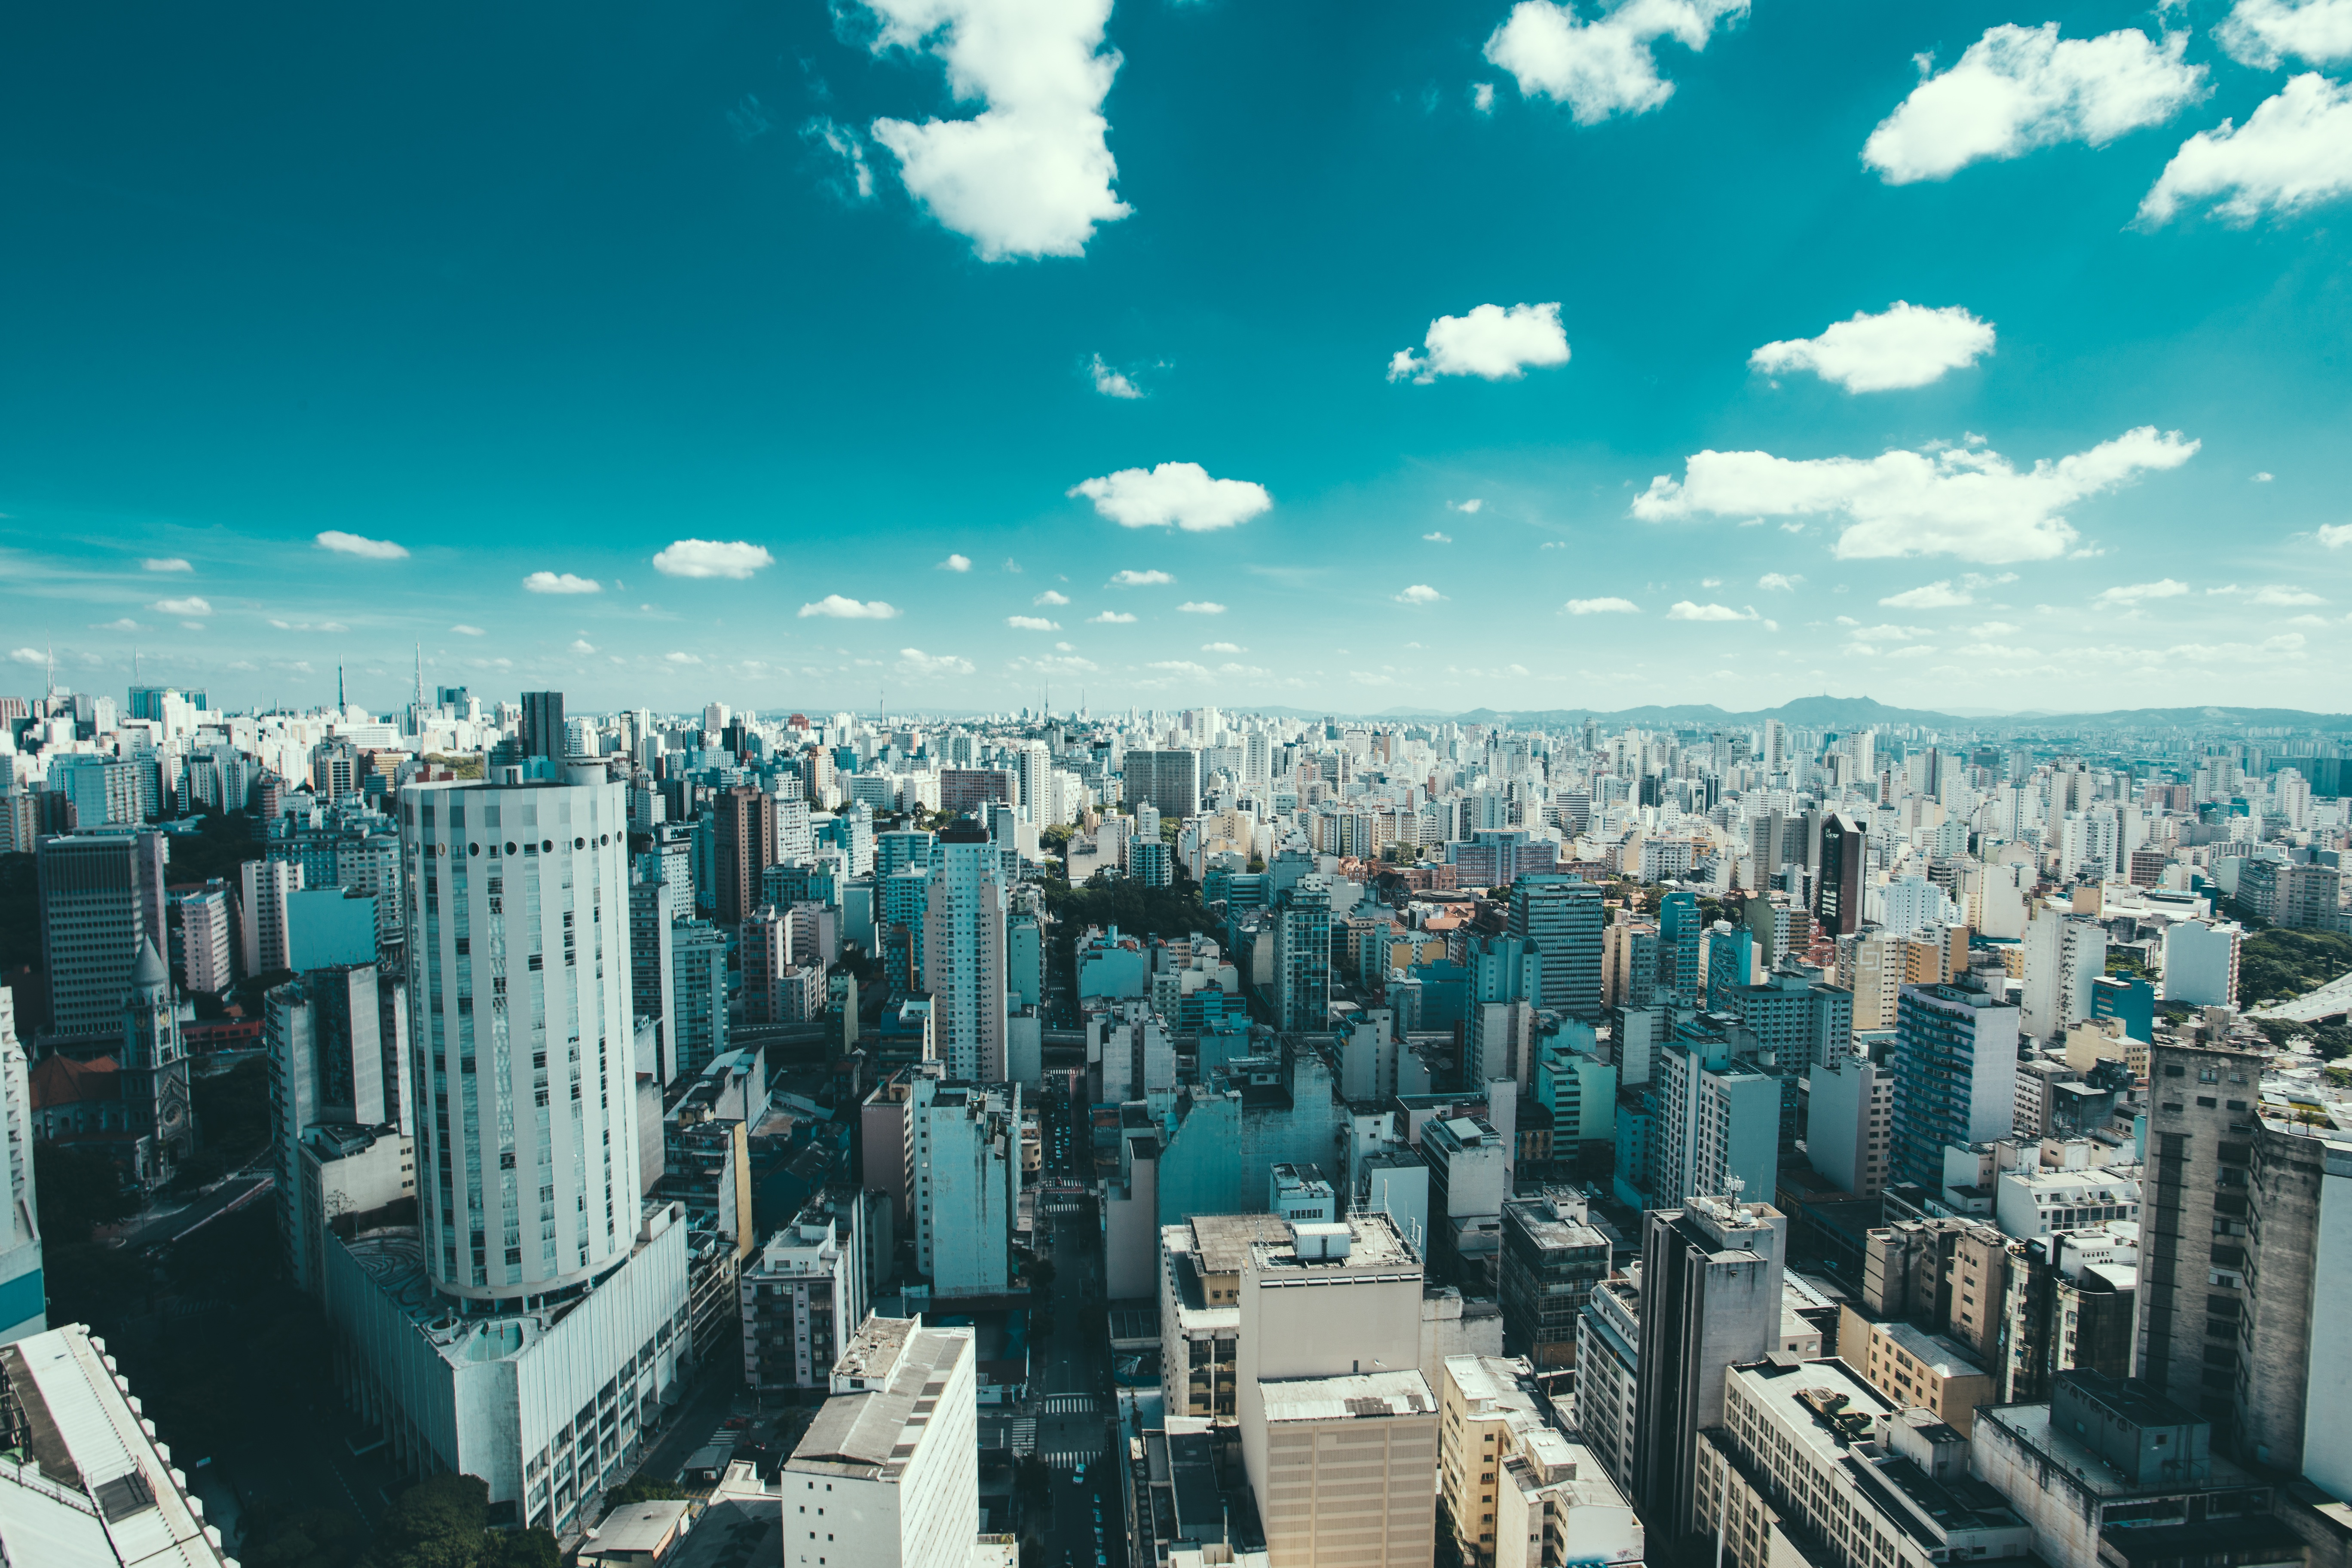 Santo Antônio de Posse - São Paulo